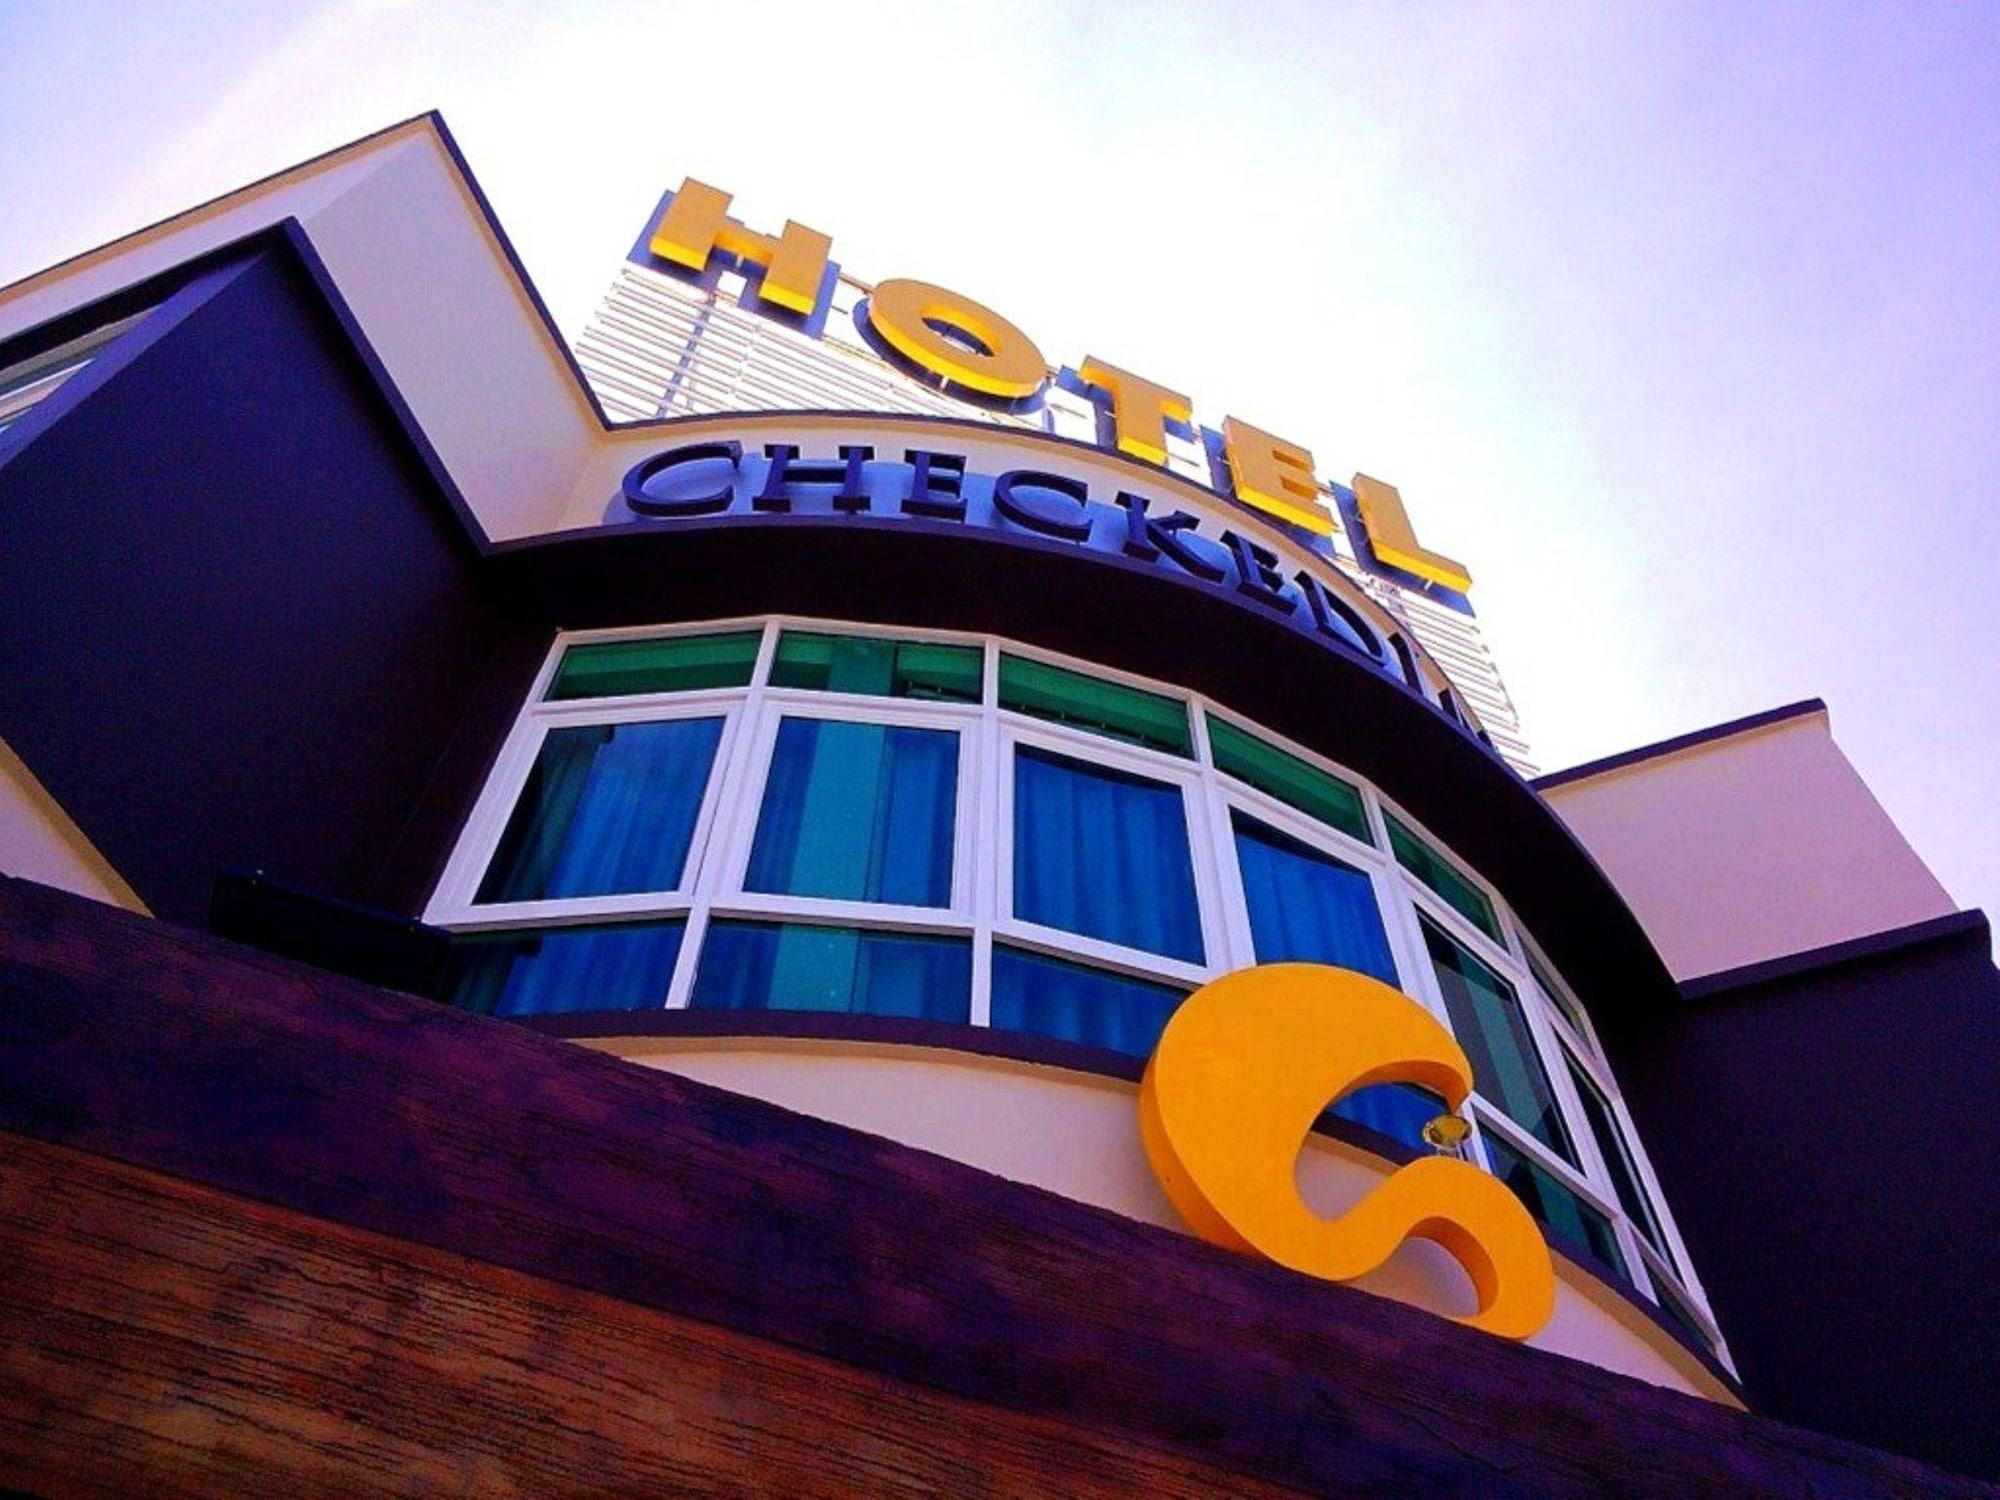 Hotel CheckedInn, Kinta